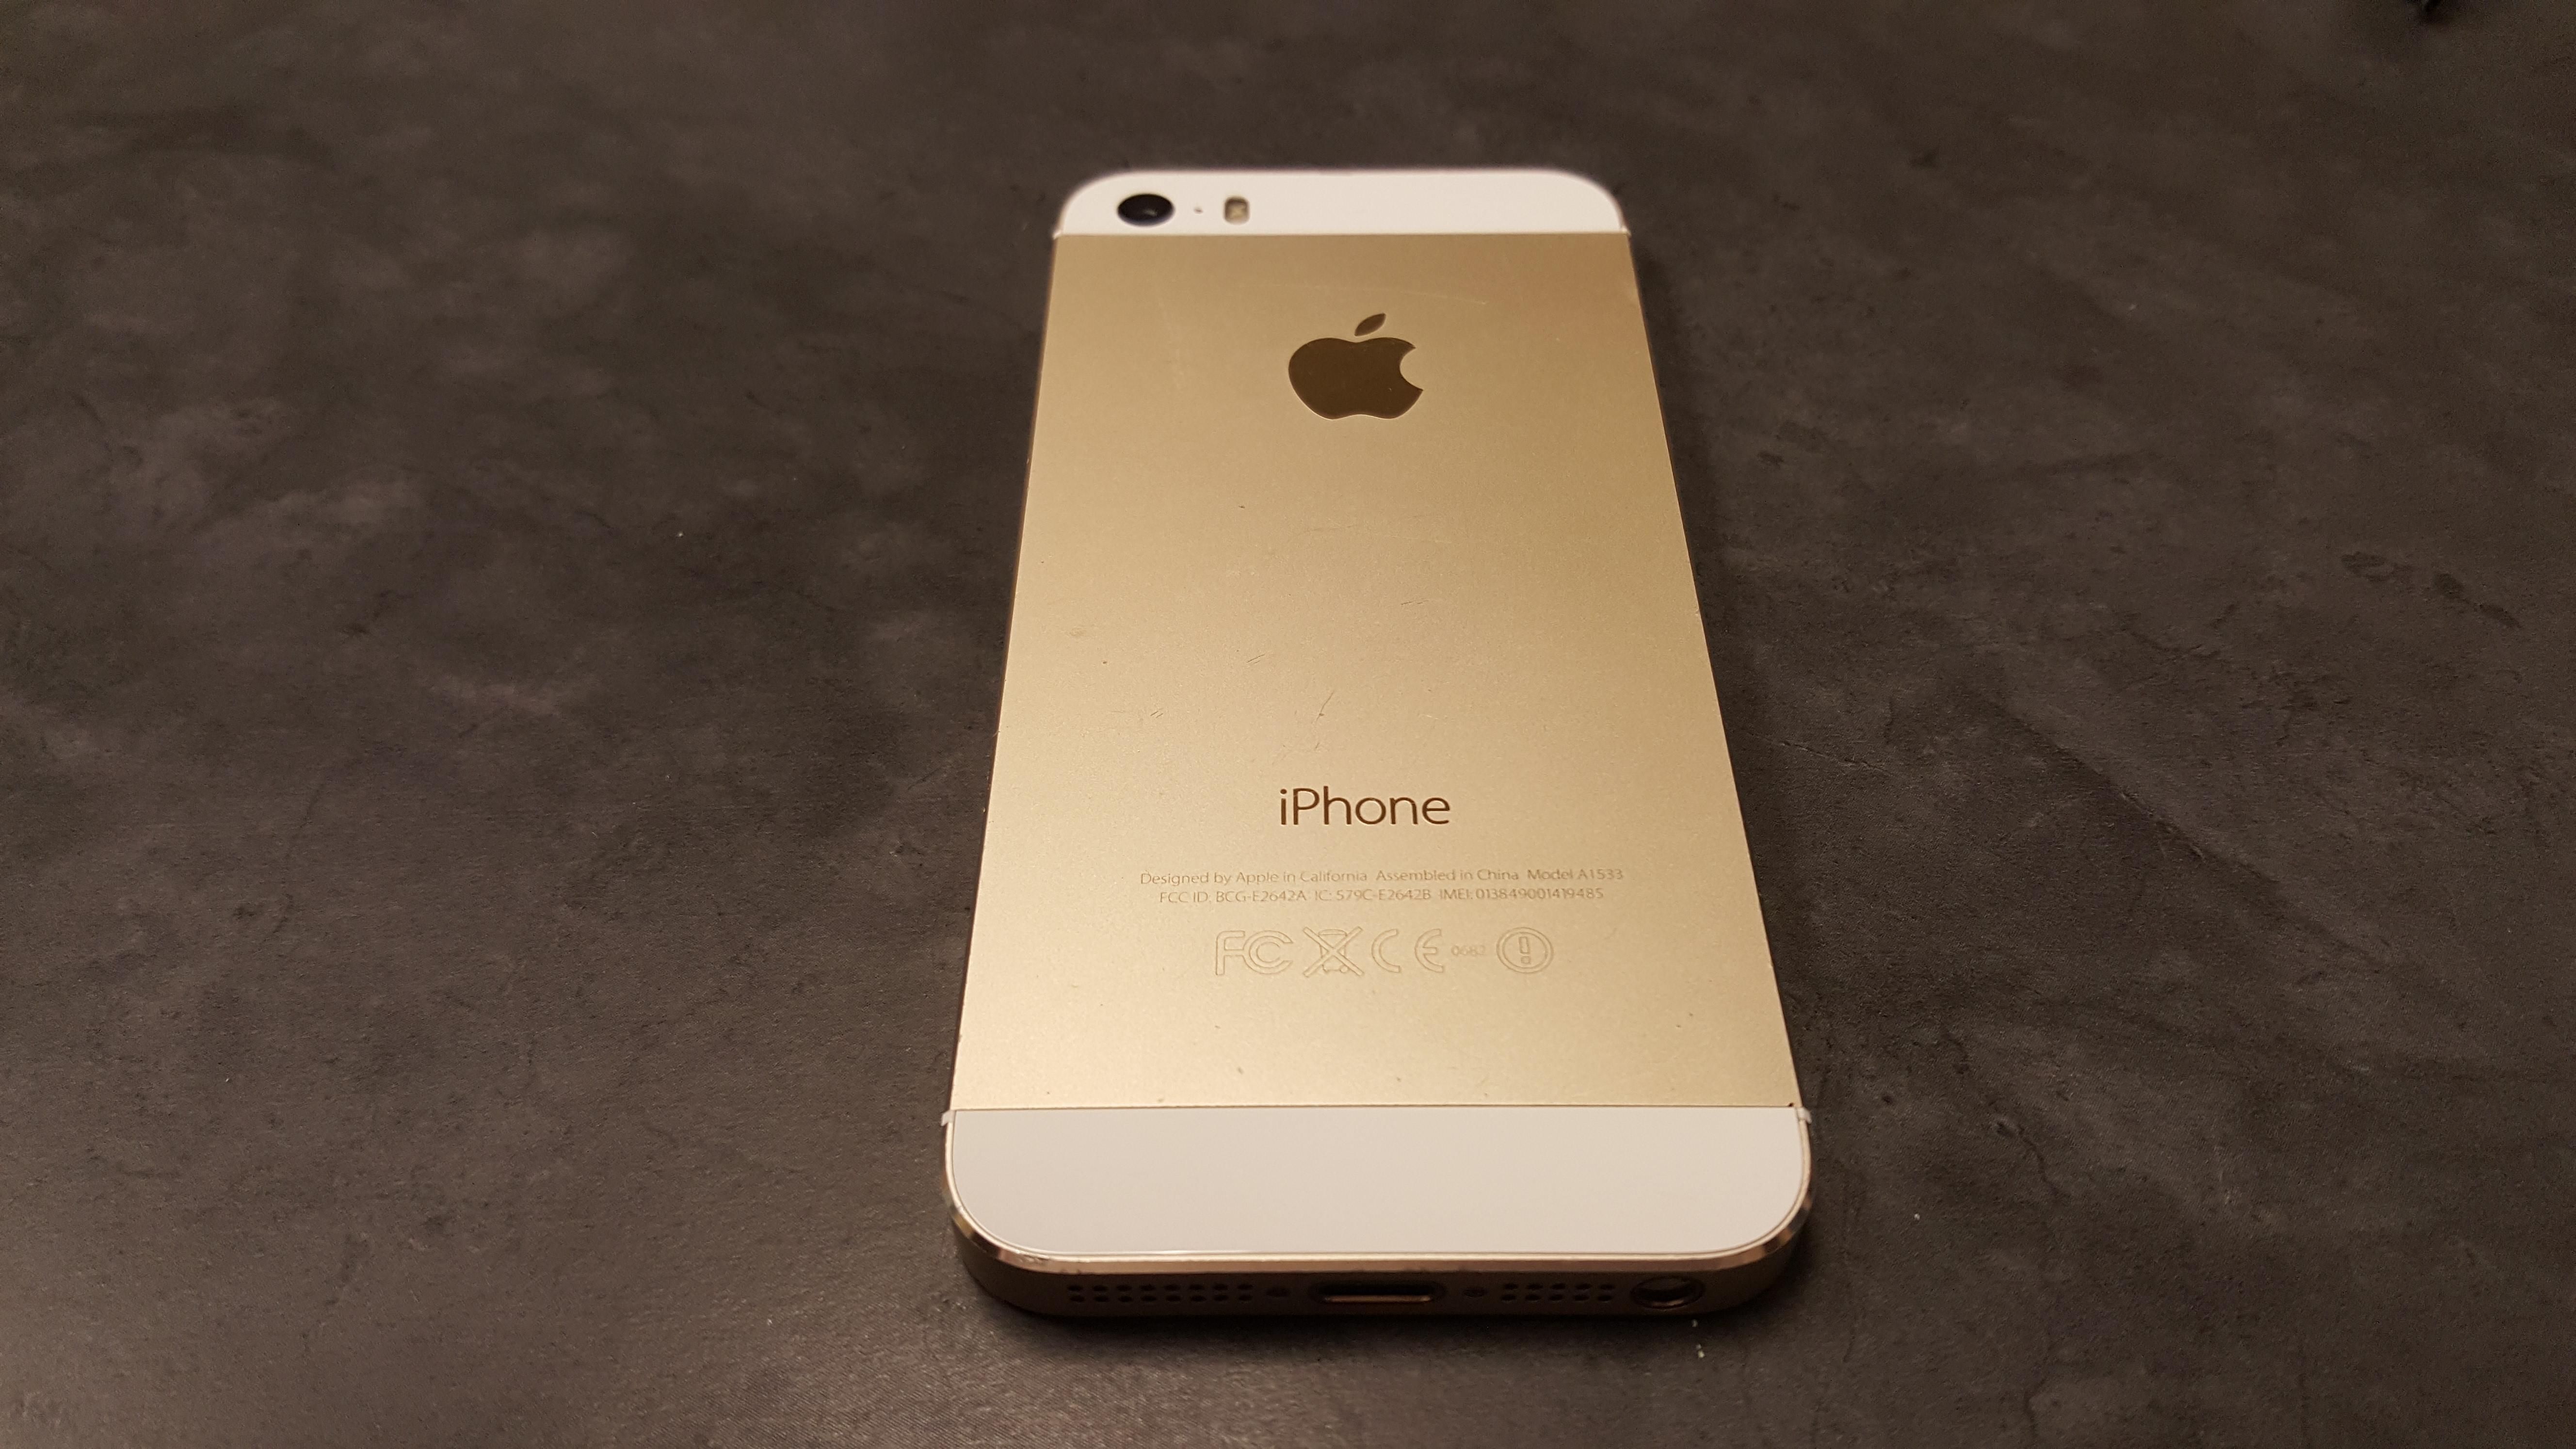 apple iphone 5s gold 32gb t mobile unlocked smartphone. Black Bedroom Furniture Sets. Home Design Ideas